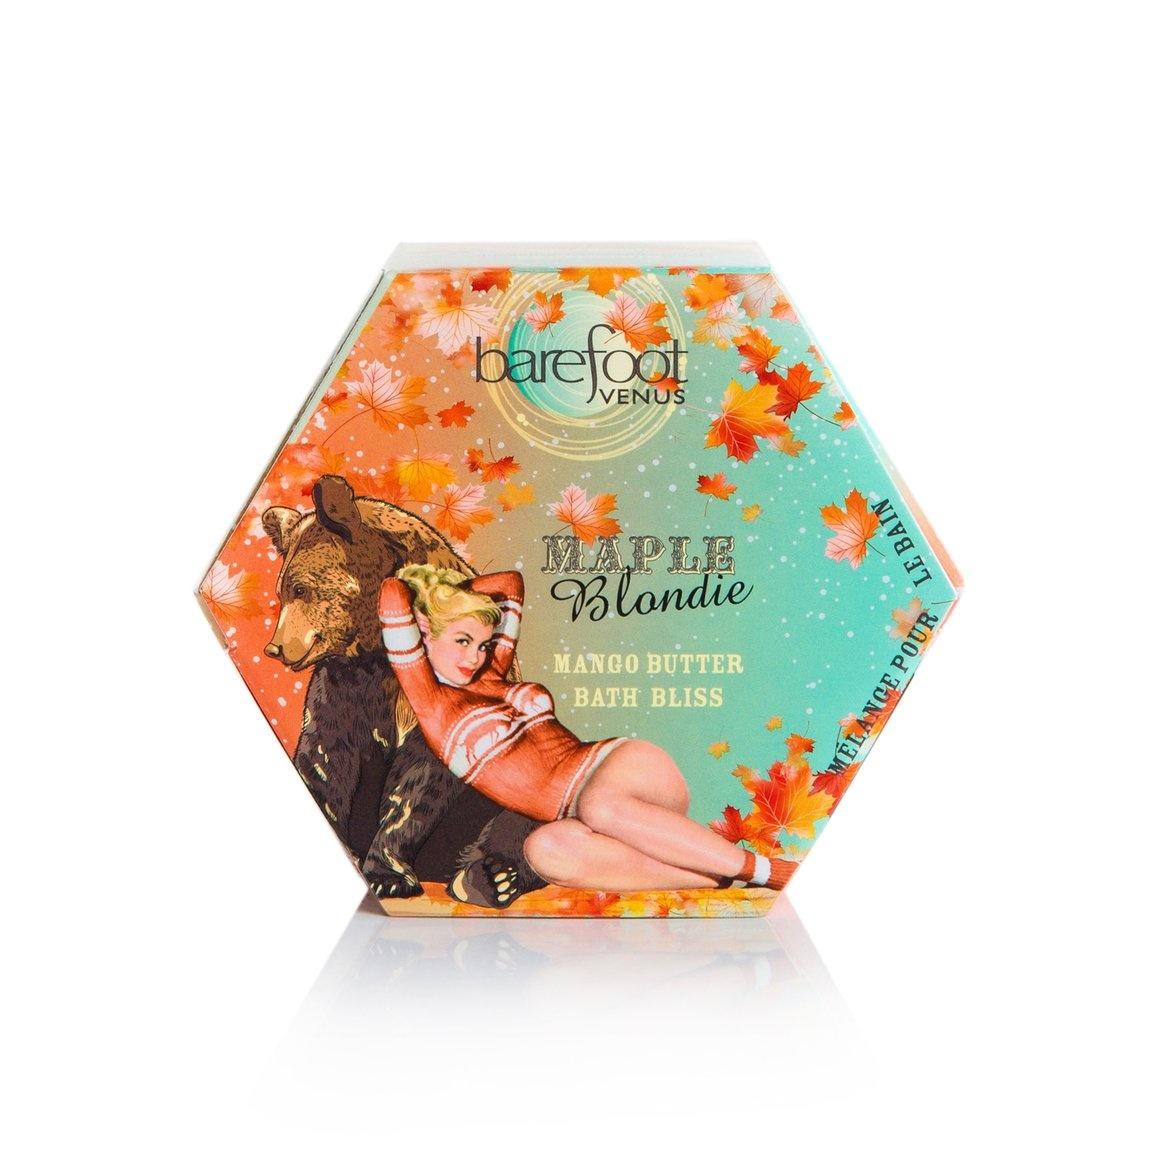 Barefoot Venus Maple Blondie Bath Bliss